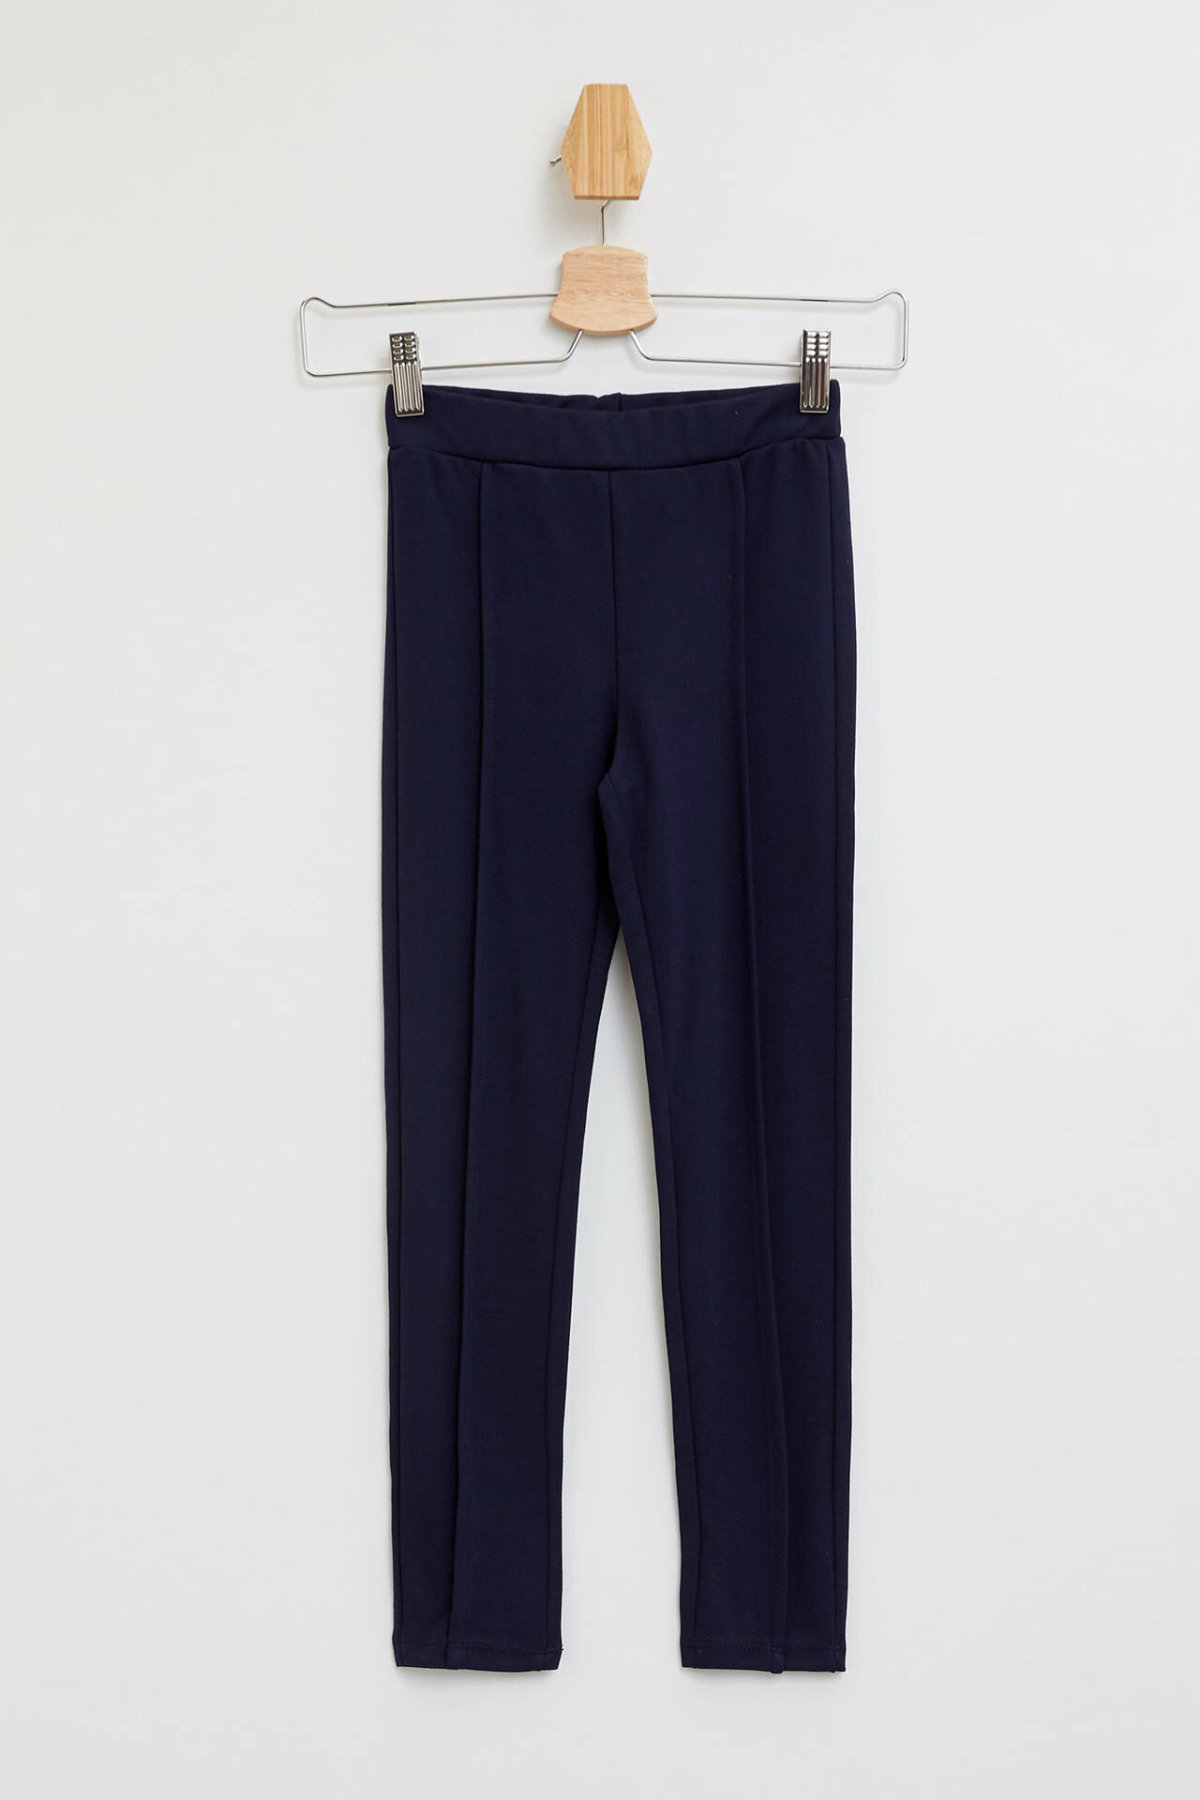 DeFacto Girl Autumn Elastic Solid Color Long Pants Girls Casual Black Navy Blue Leggings Kids Legging Bottoms-H9614A619AU